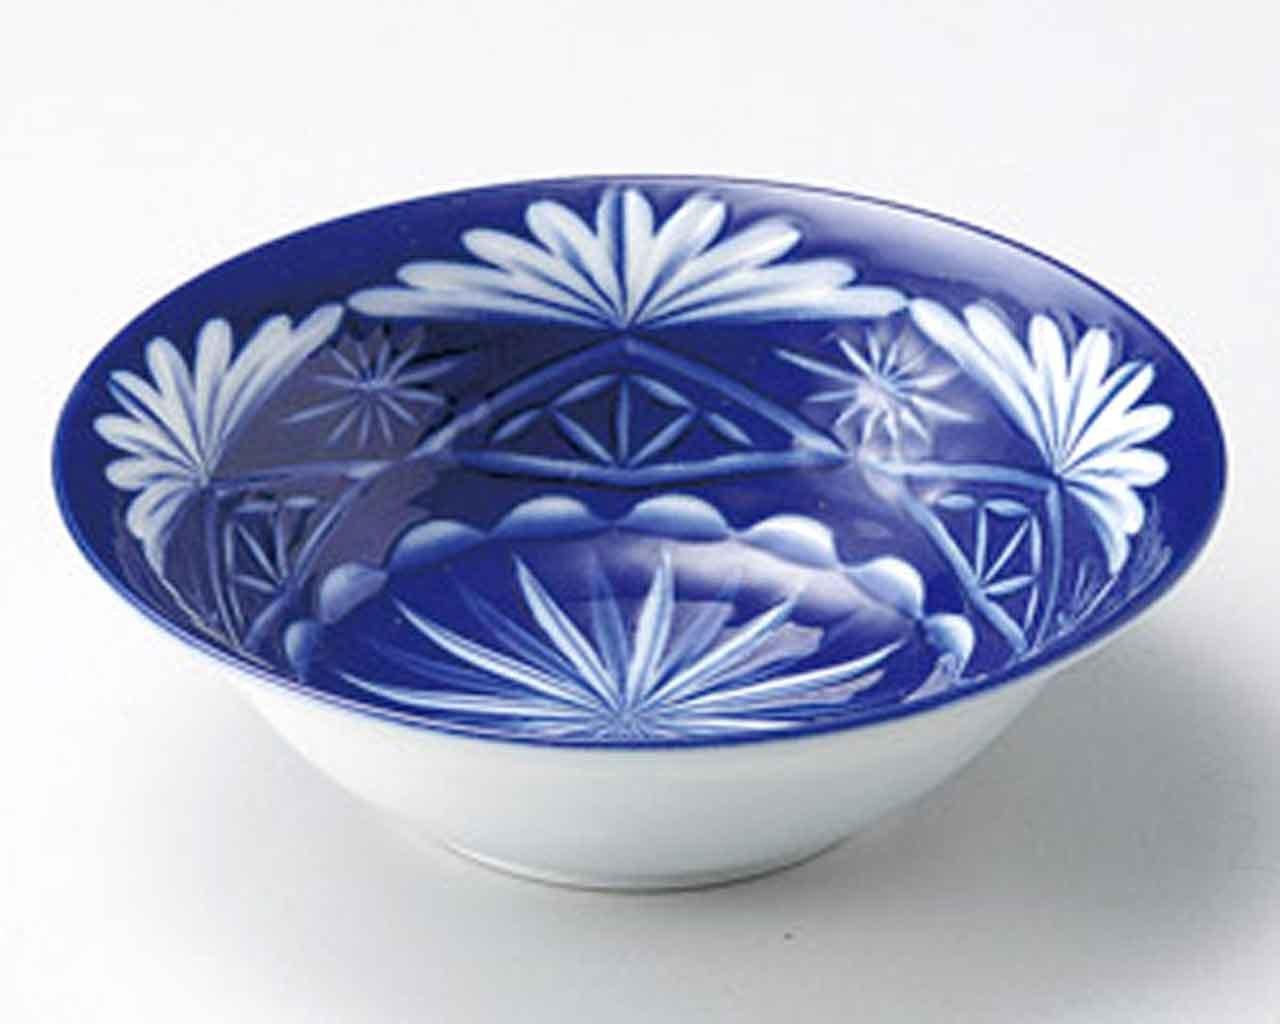 Kiriko 5.7inch Medium Plate White porcelain Made in Japan